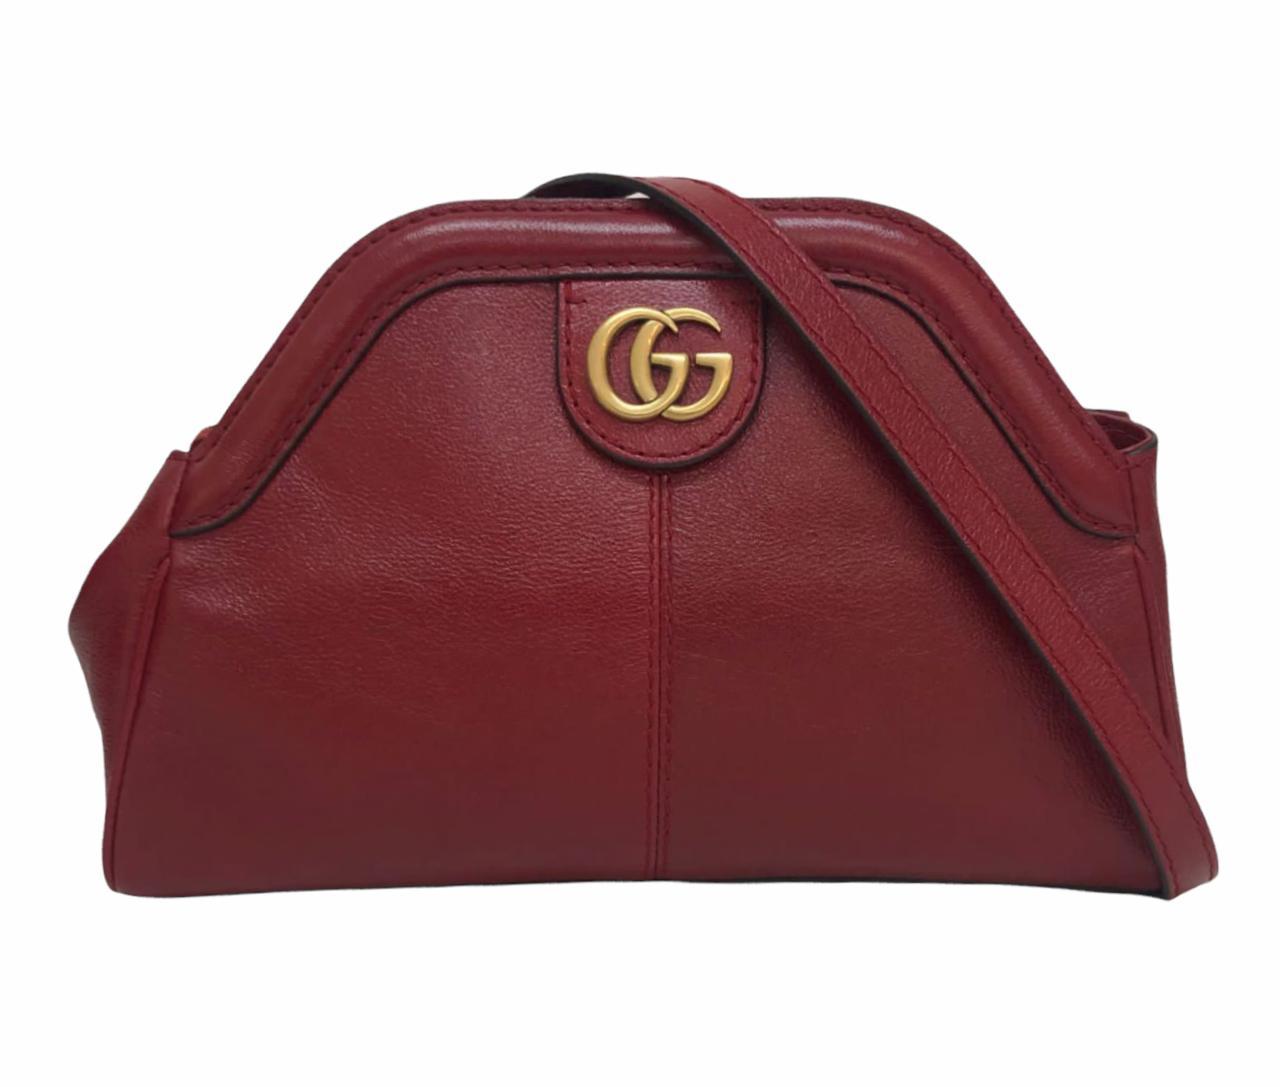 Bolsa Gucci RE(BELLE) Small Vermelha